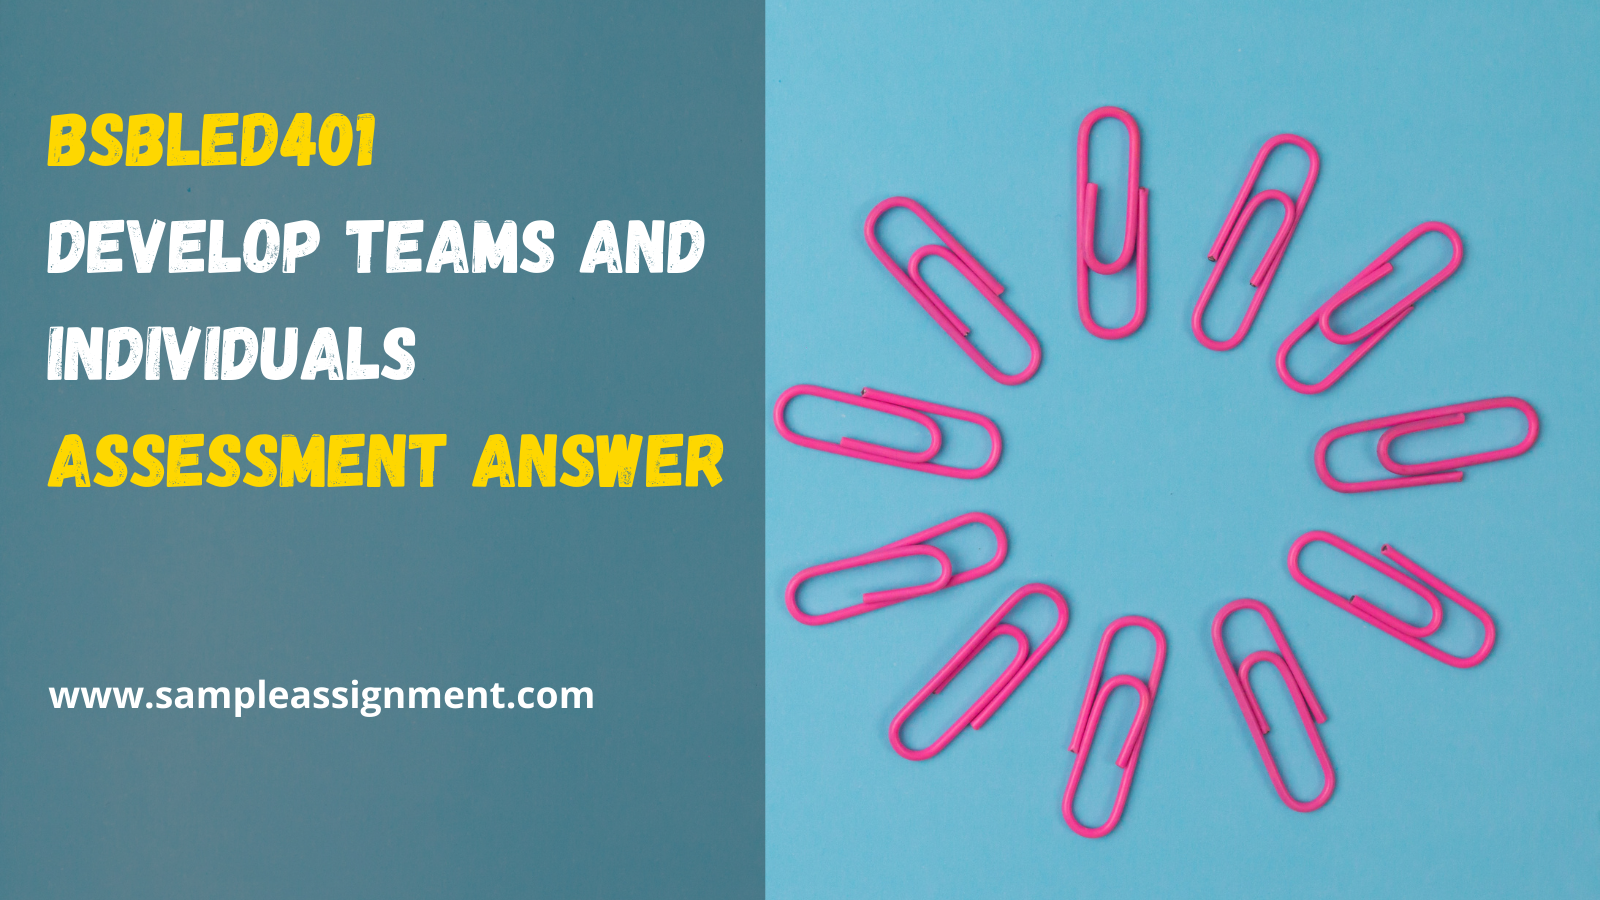 BSBLED401 Assessment Answer